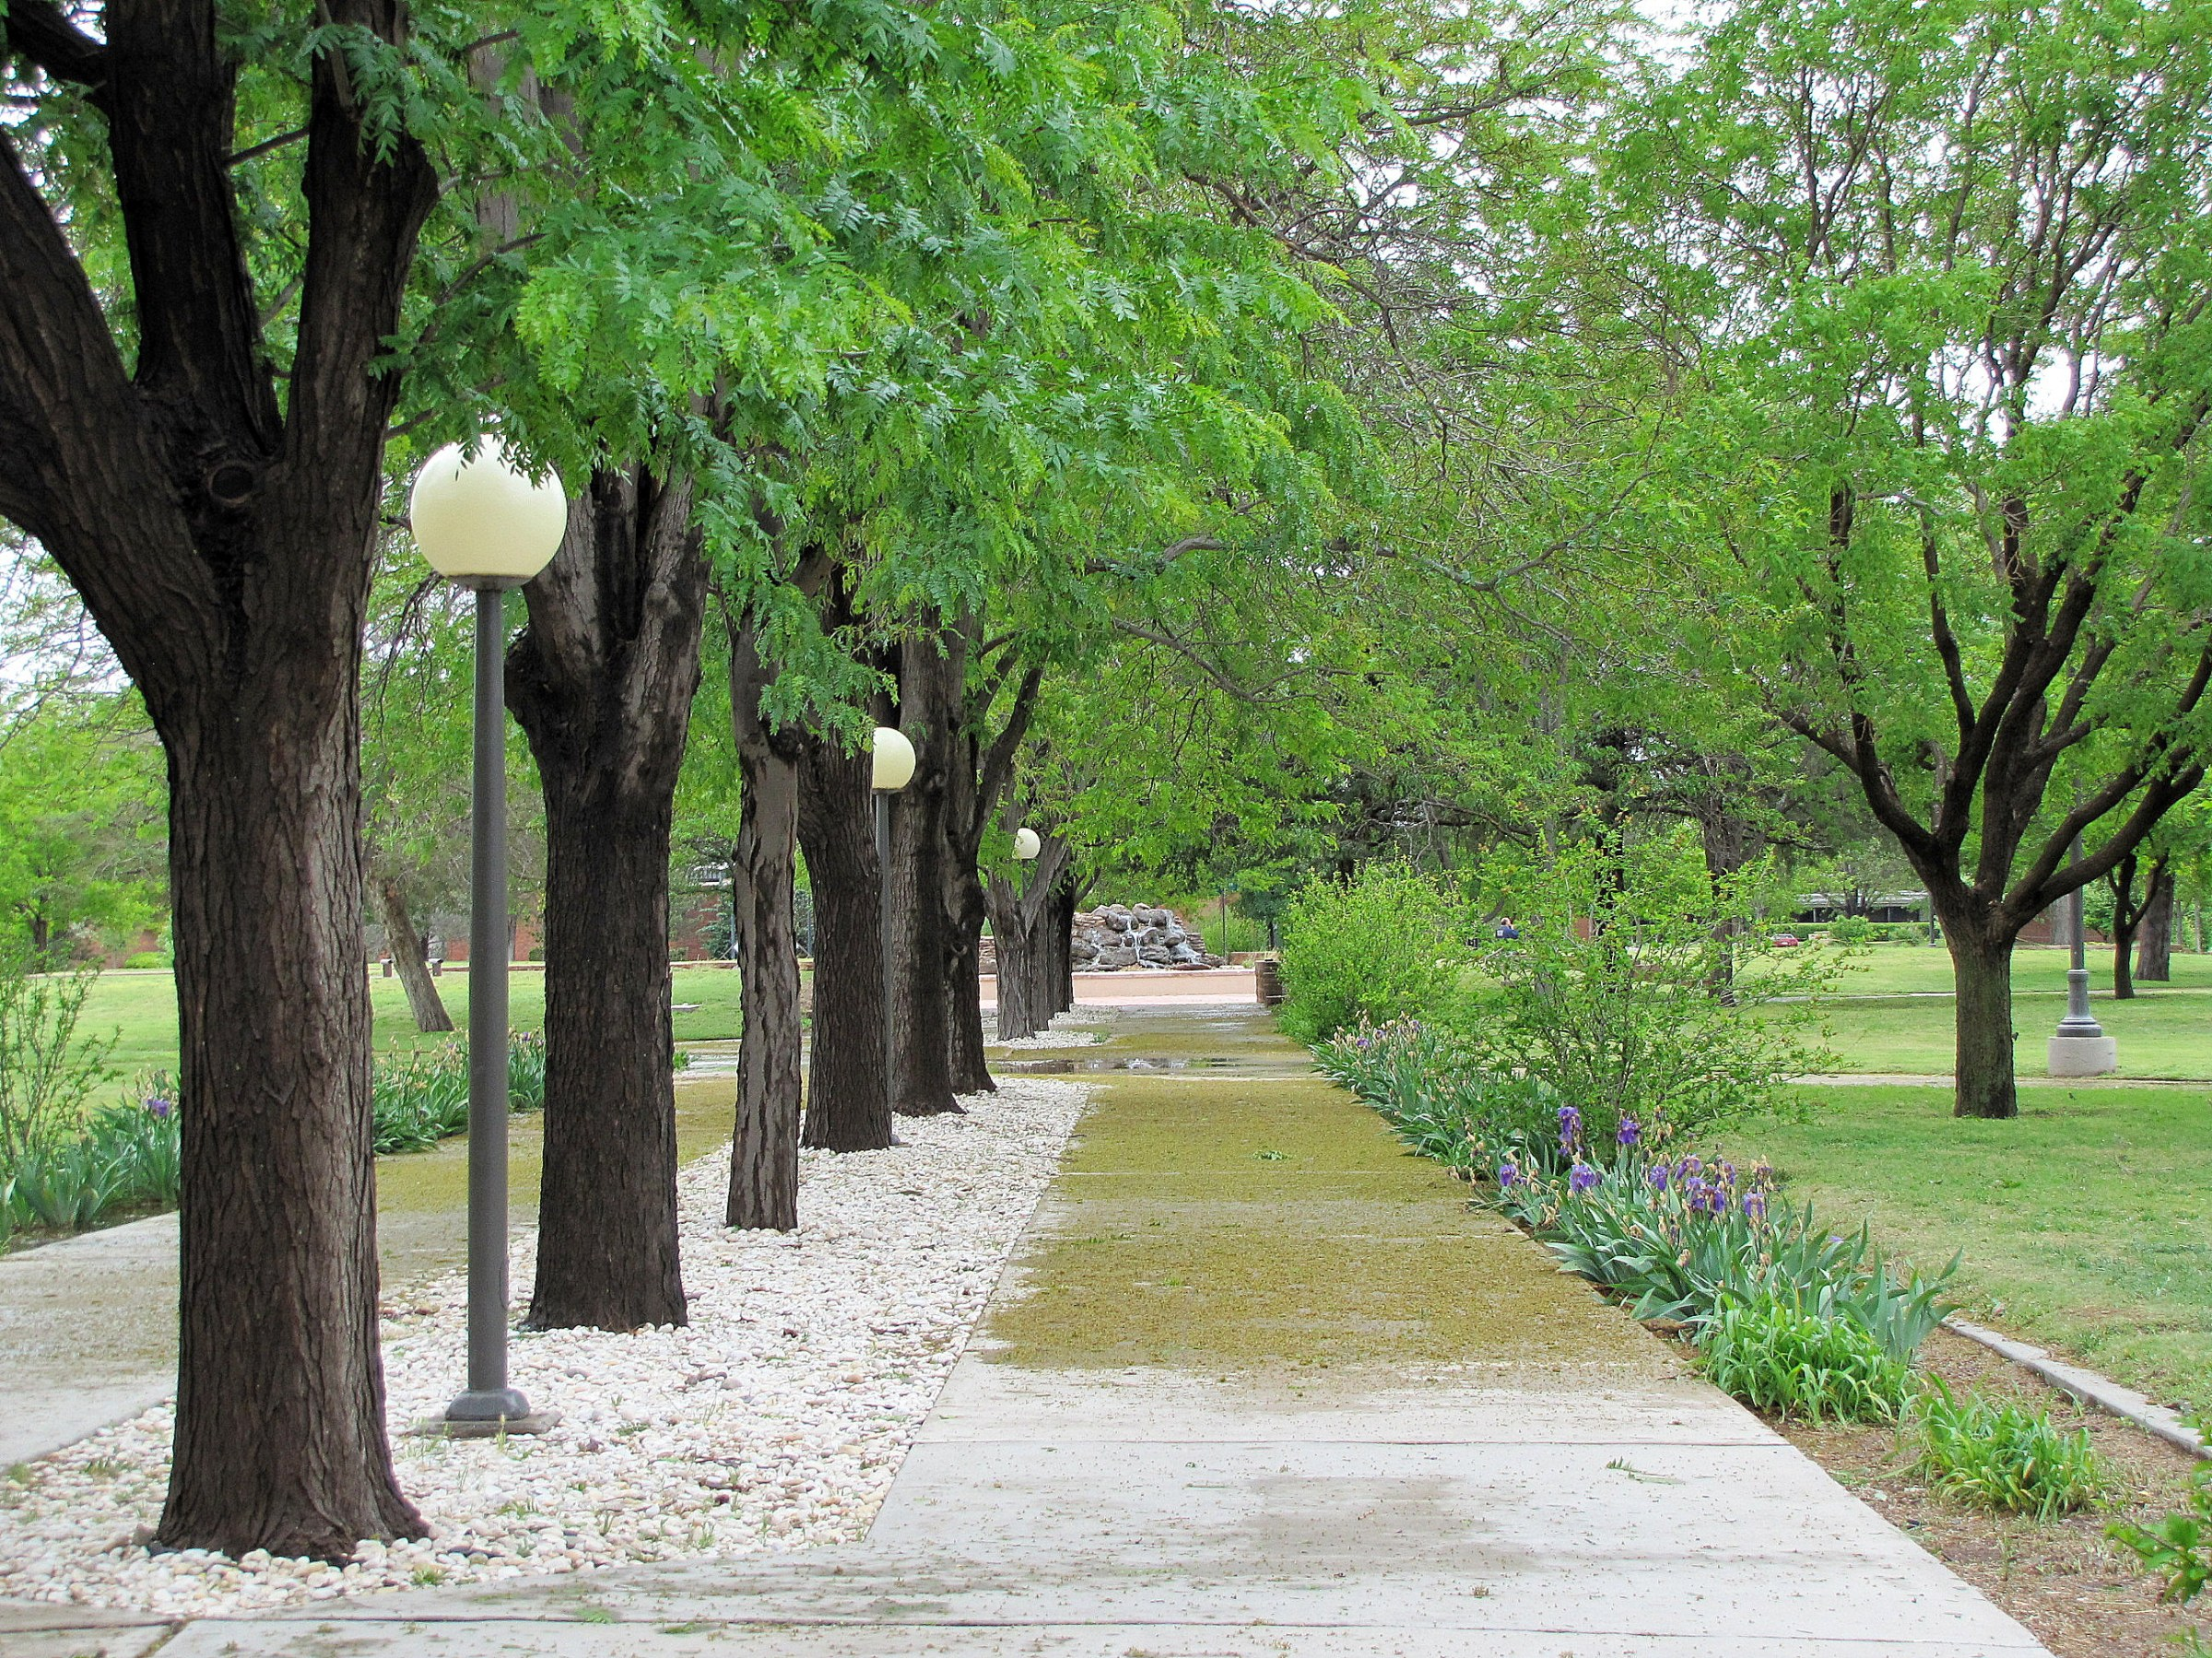 ENMU Campus View